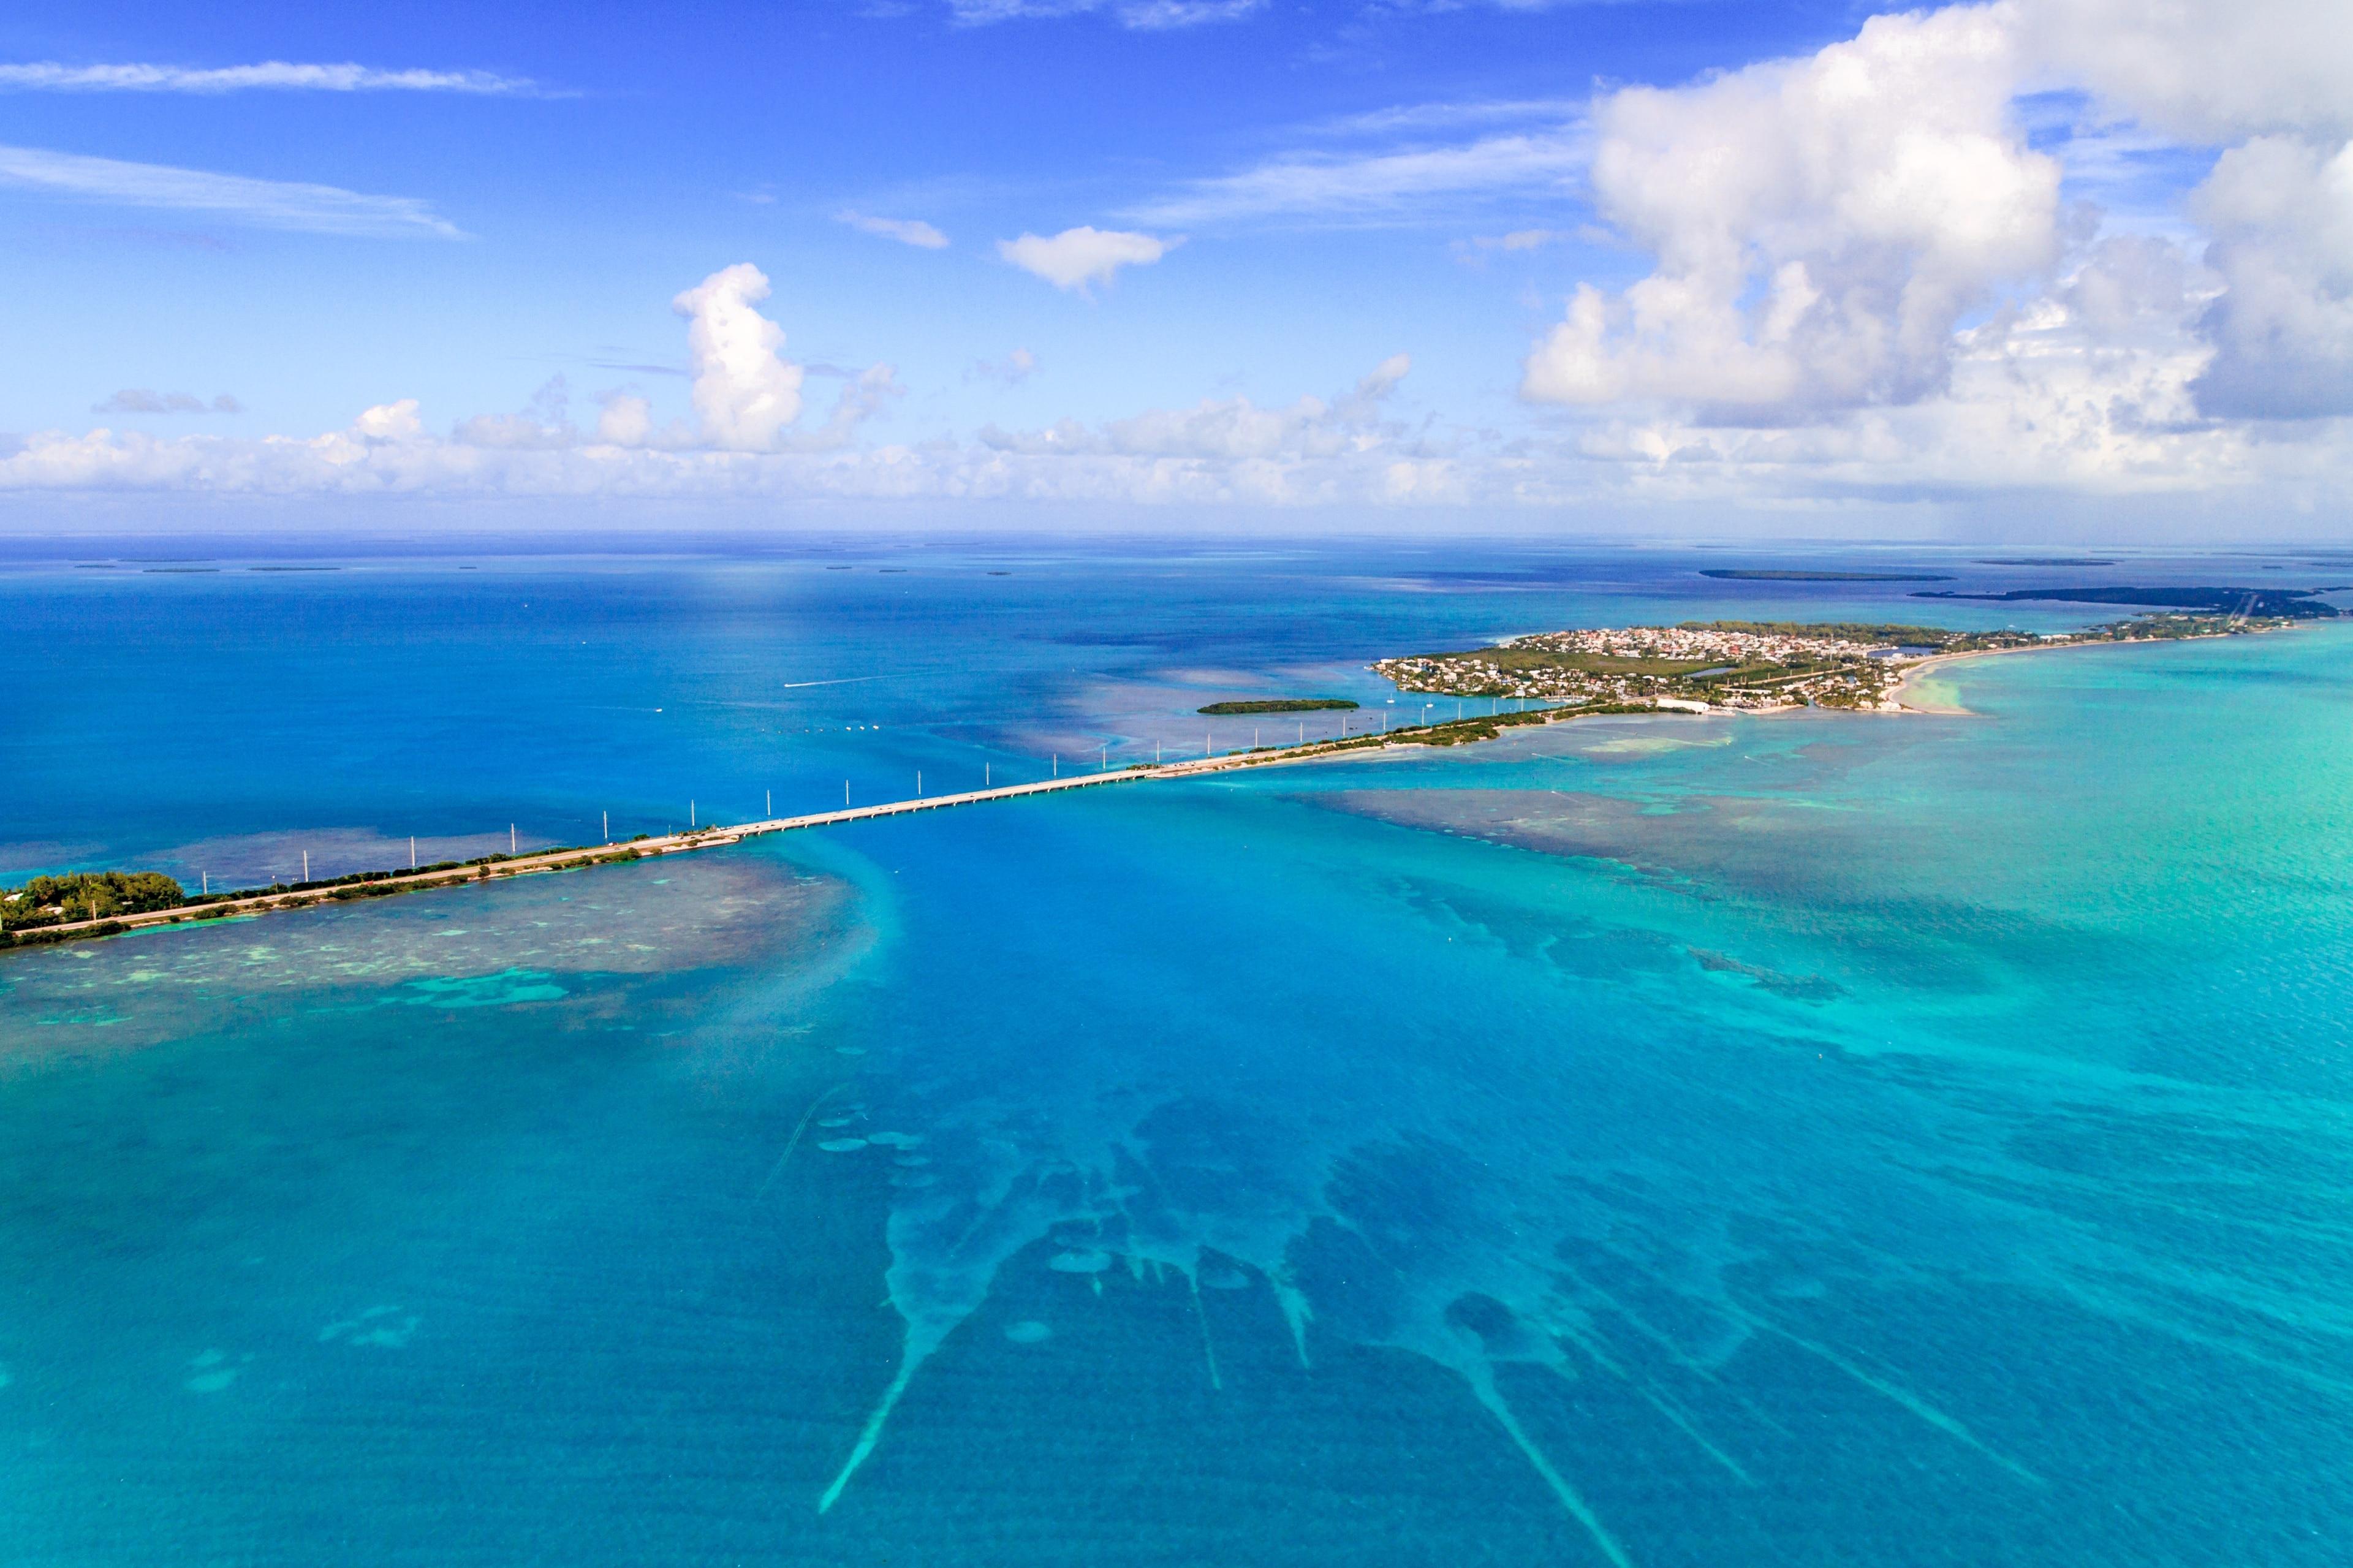 Sugarloaf Key, Florida, United States of America